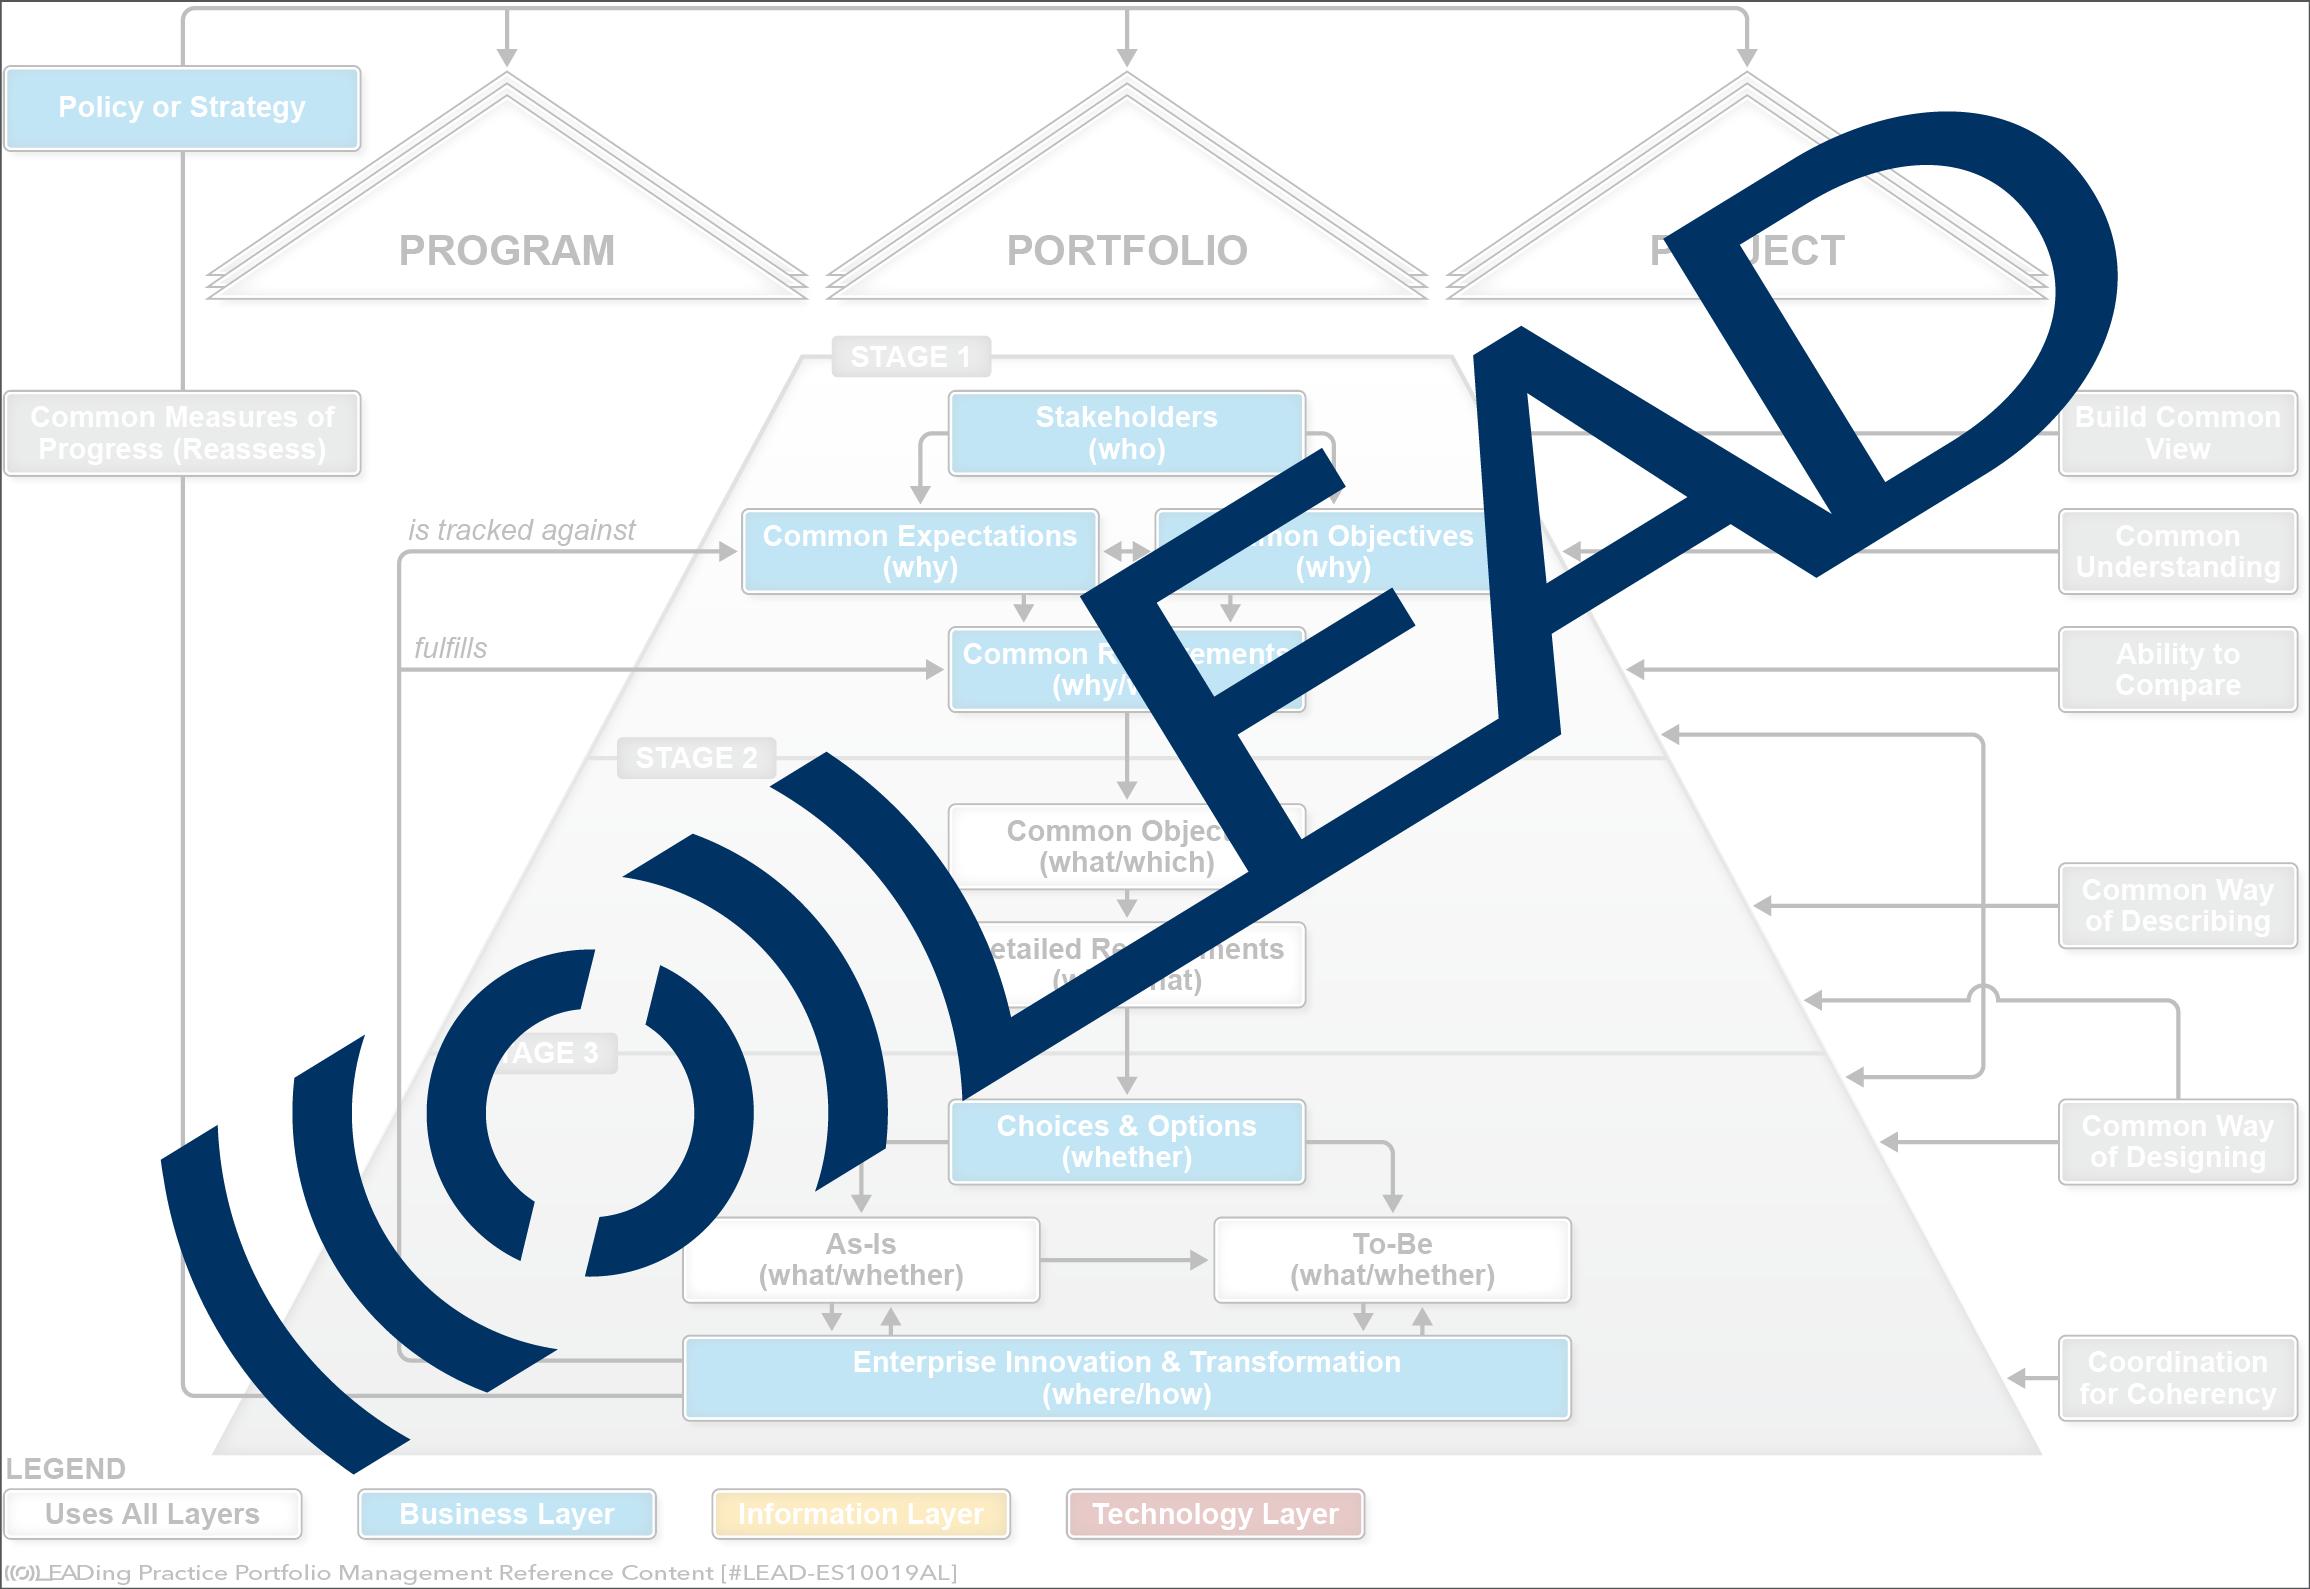 Alignment & Unity Model [LEAD Trademark]